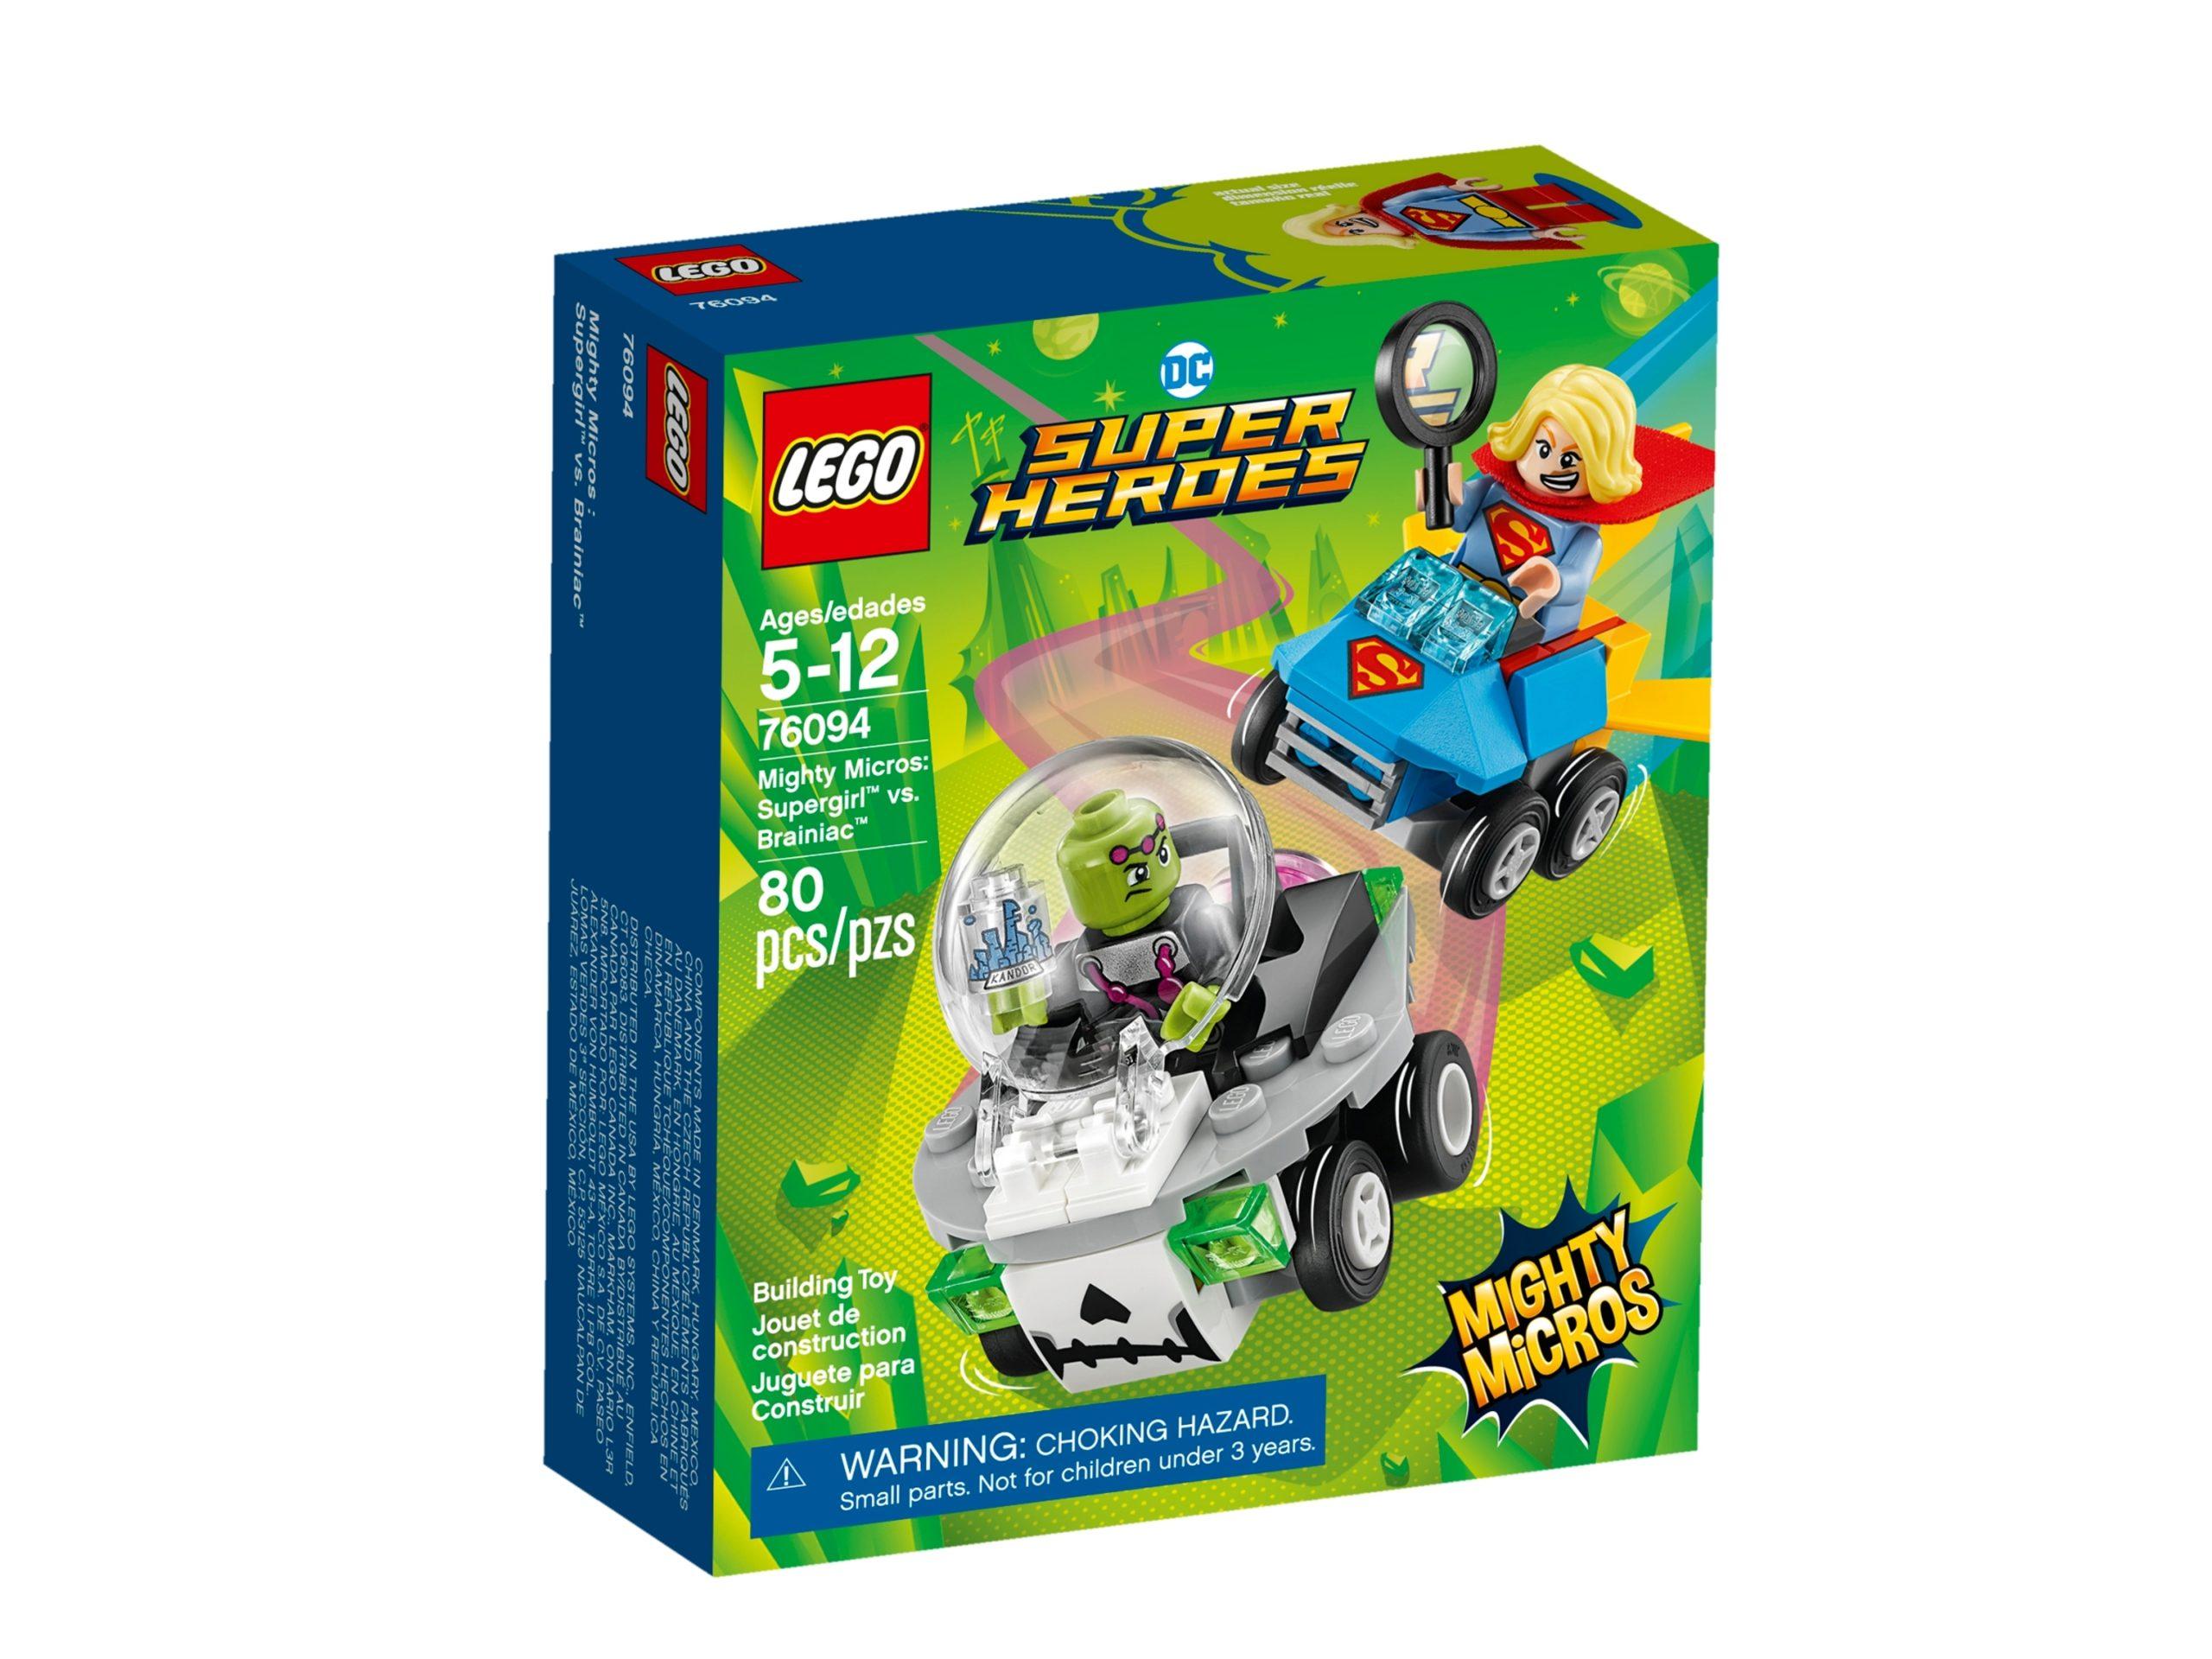 lego 76094 mighty micros supergirl vs brainiac scaled